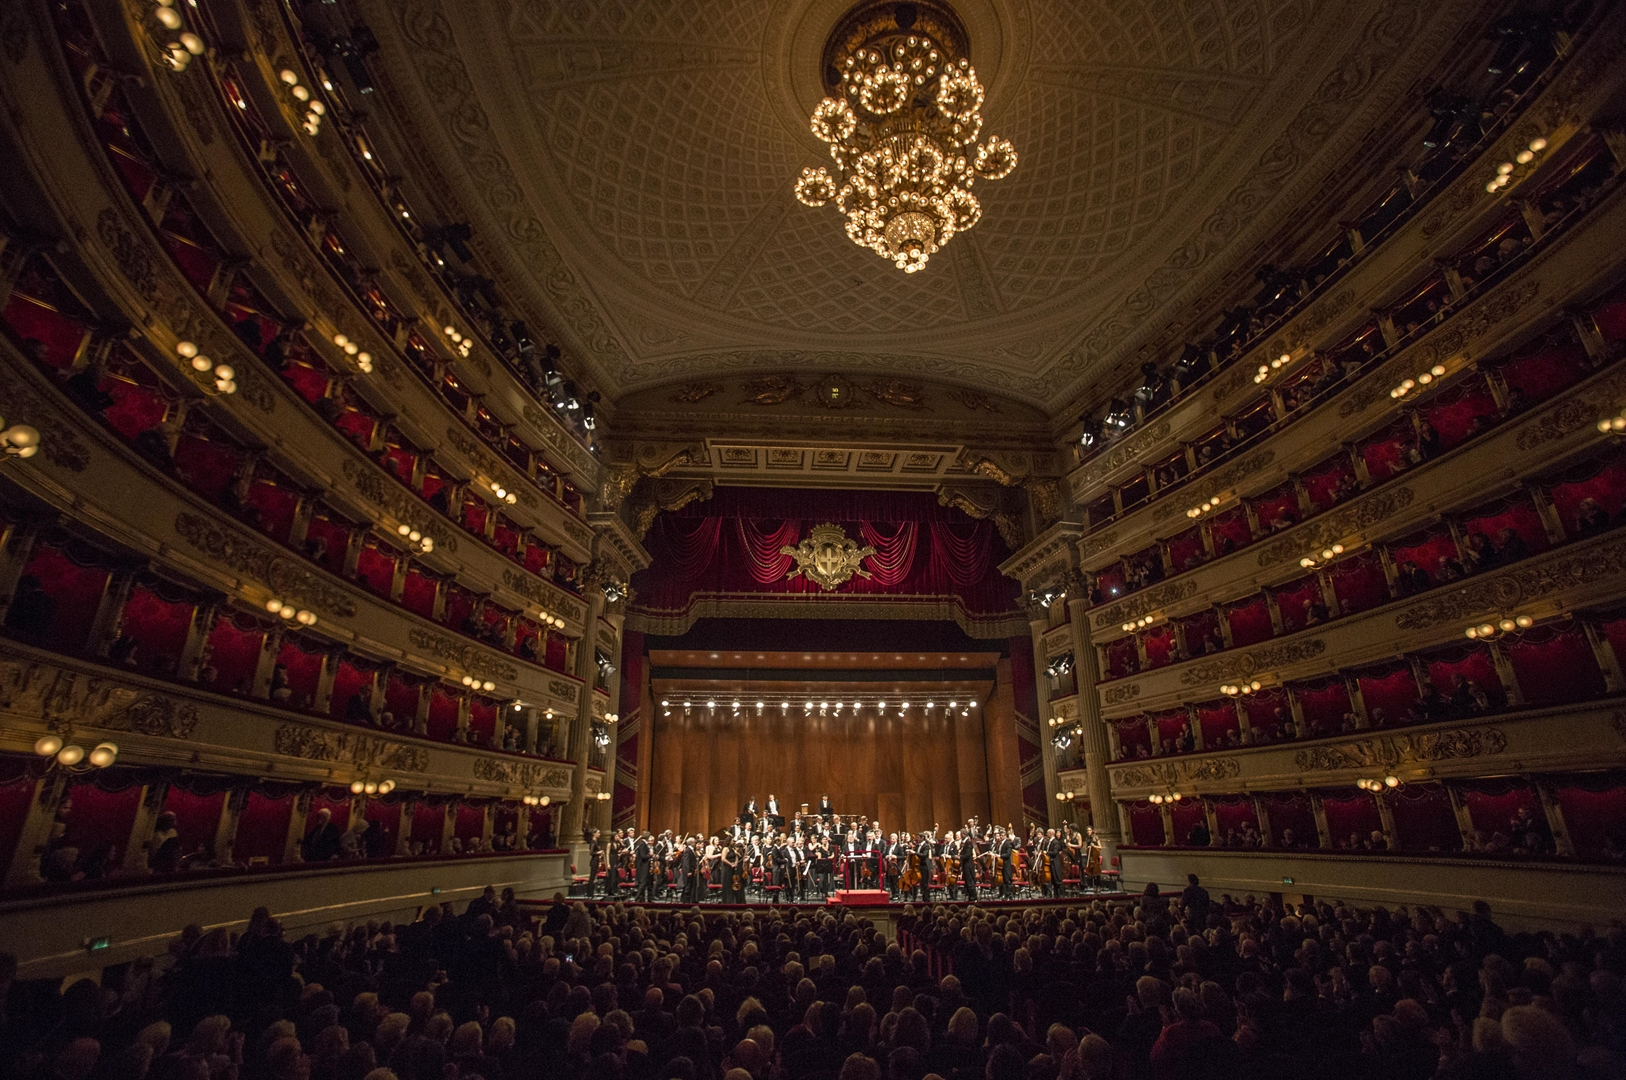 Filarmonica della Scala at Passeggiata An Airbnb Experience of Milan, www.airbnb.com, Copyright Silvia Lelli (Copy)